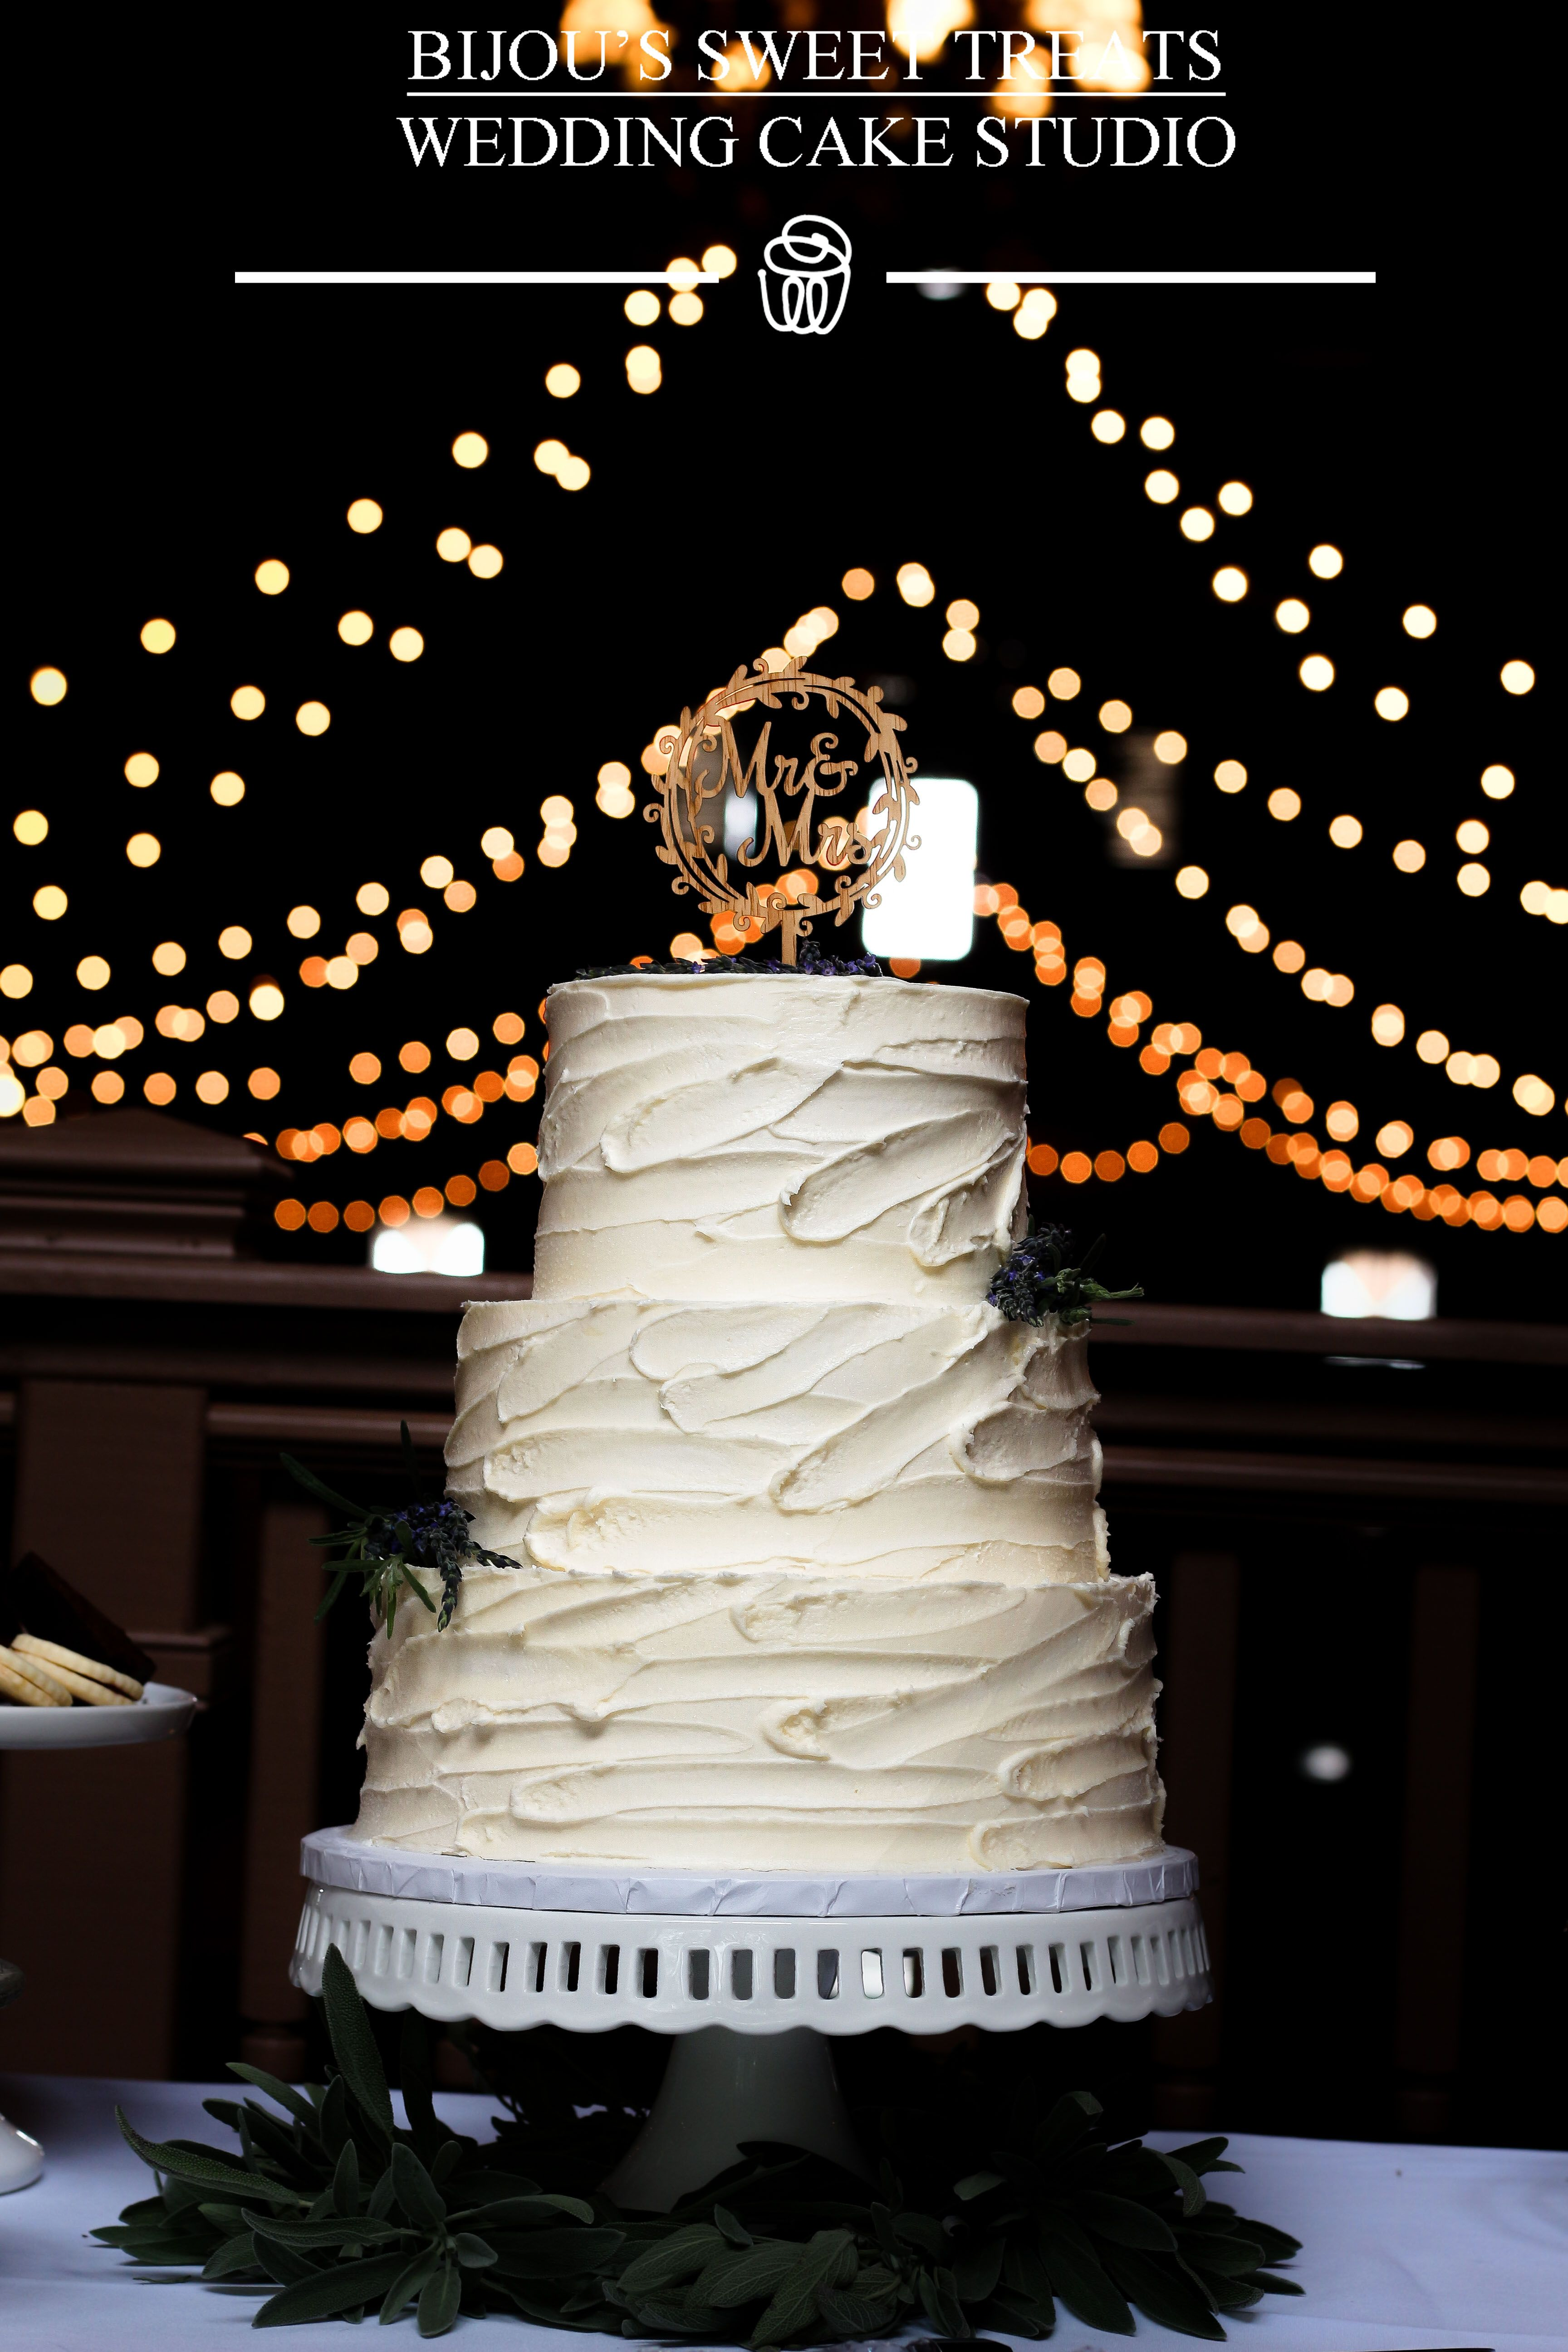 Textured Buttercream Wedding Cake By Bijou S Sweet Treats Wedding